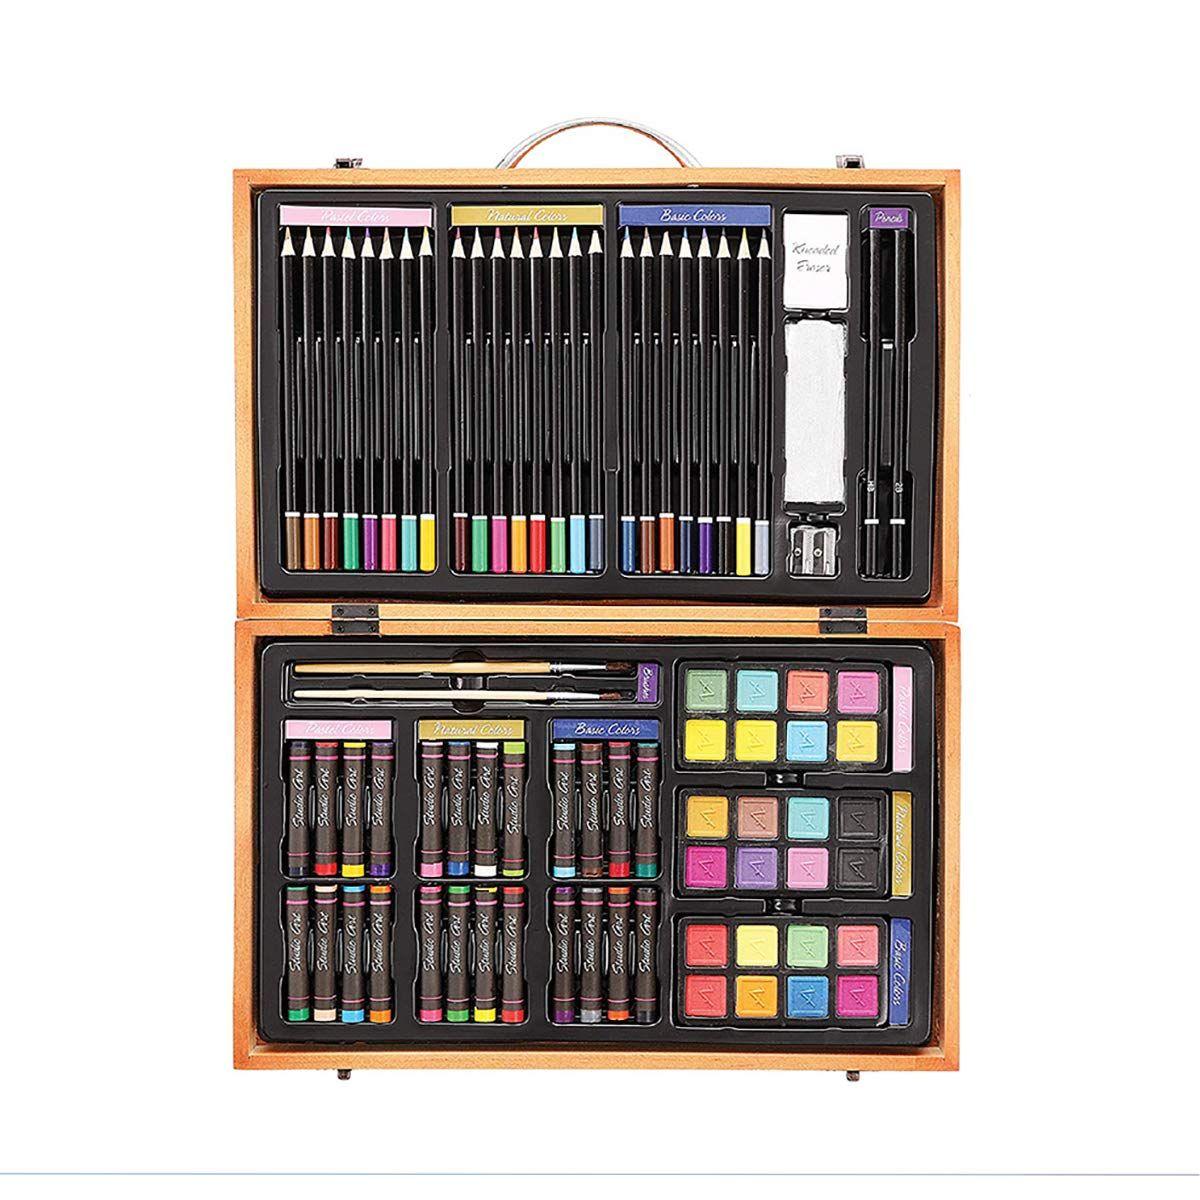 Darice 80Piece Deluxe Art Set Art Supplies for Drawing